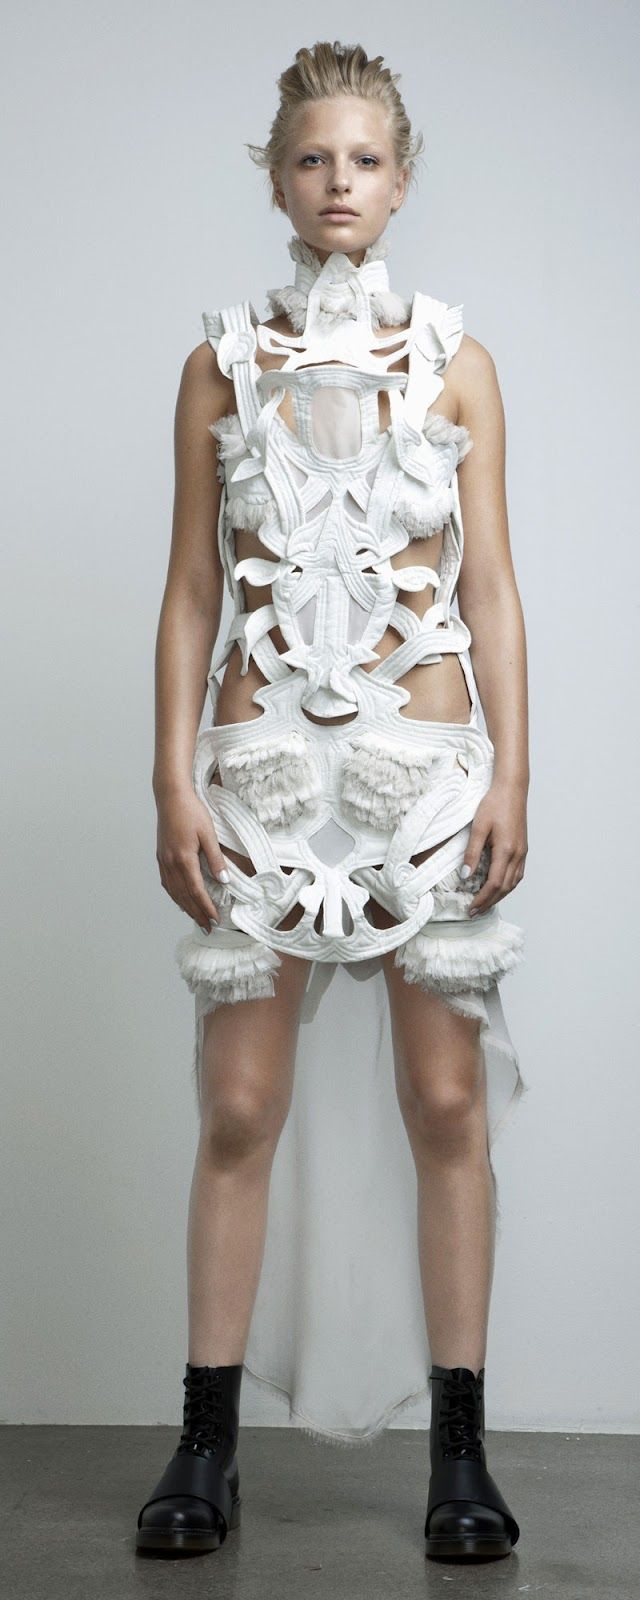 Intricate Interlocking Patterns - a mix of organic, alien and futuristic; sculptural symmetry; fashion meets art // Anne Sofie Madsen